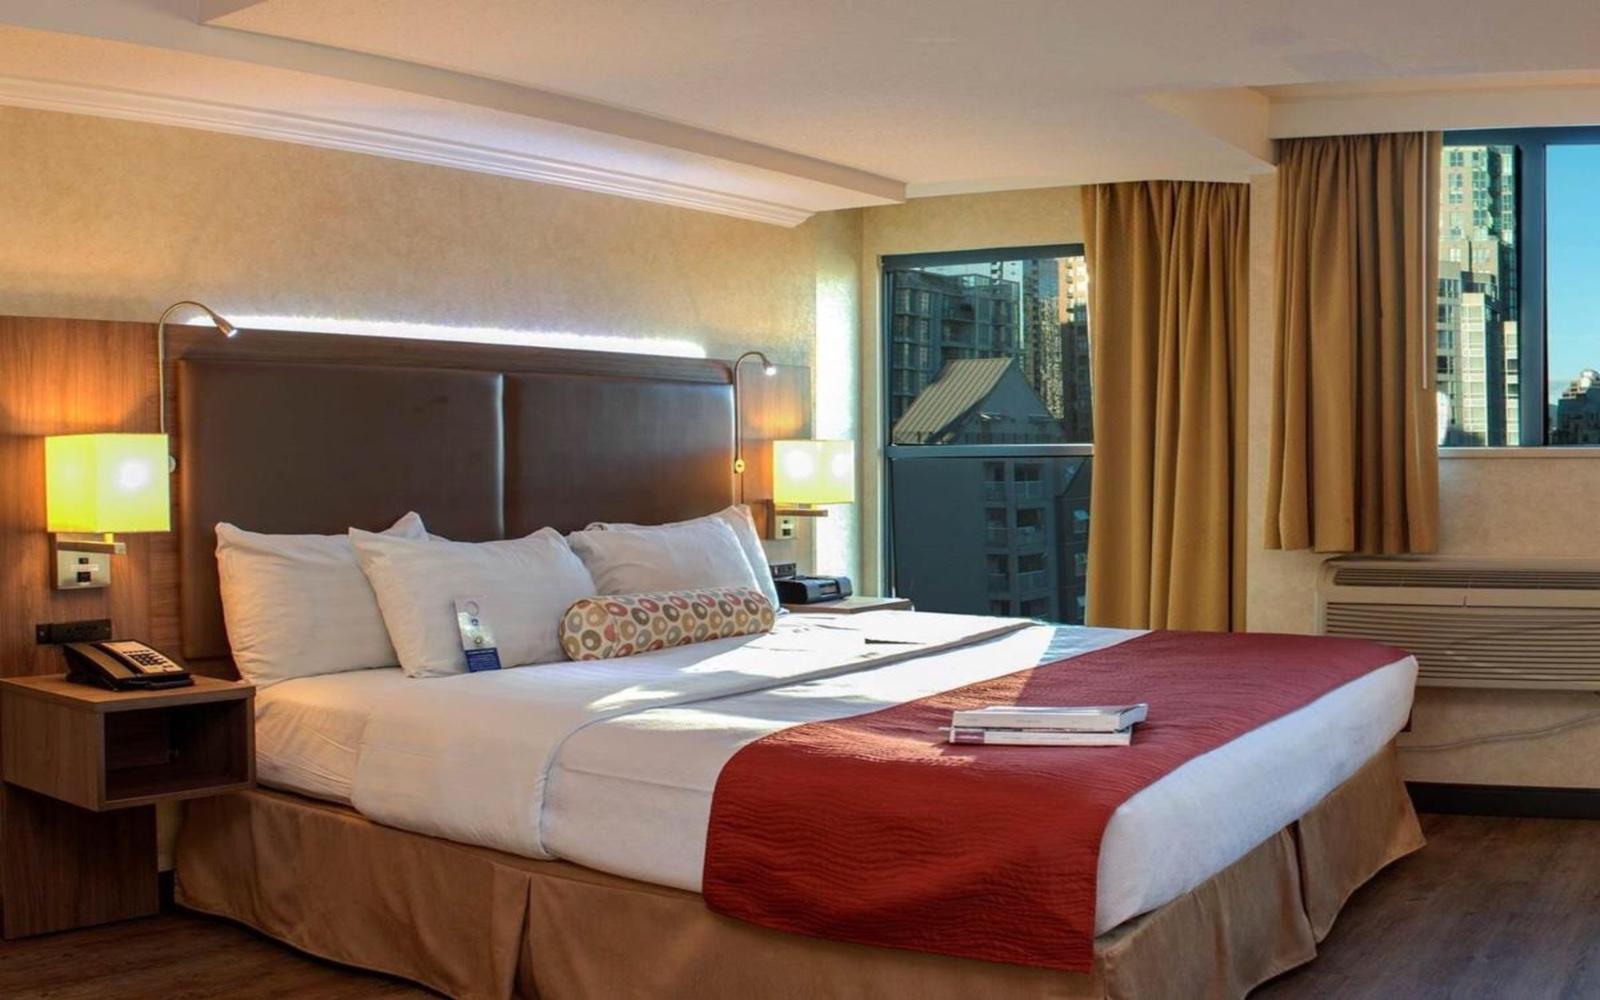 Room at GEC Granville Suites